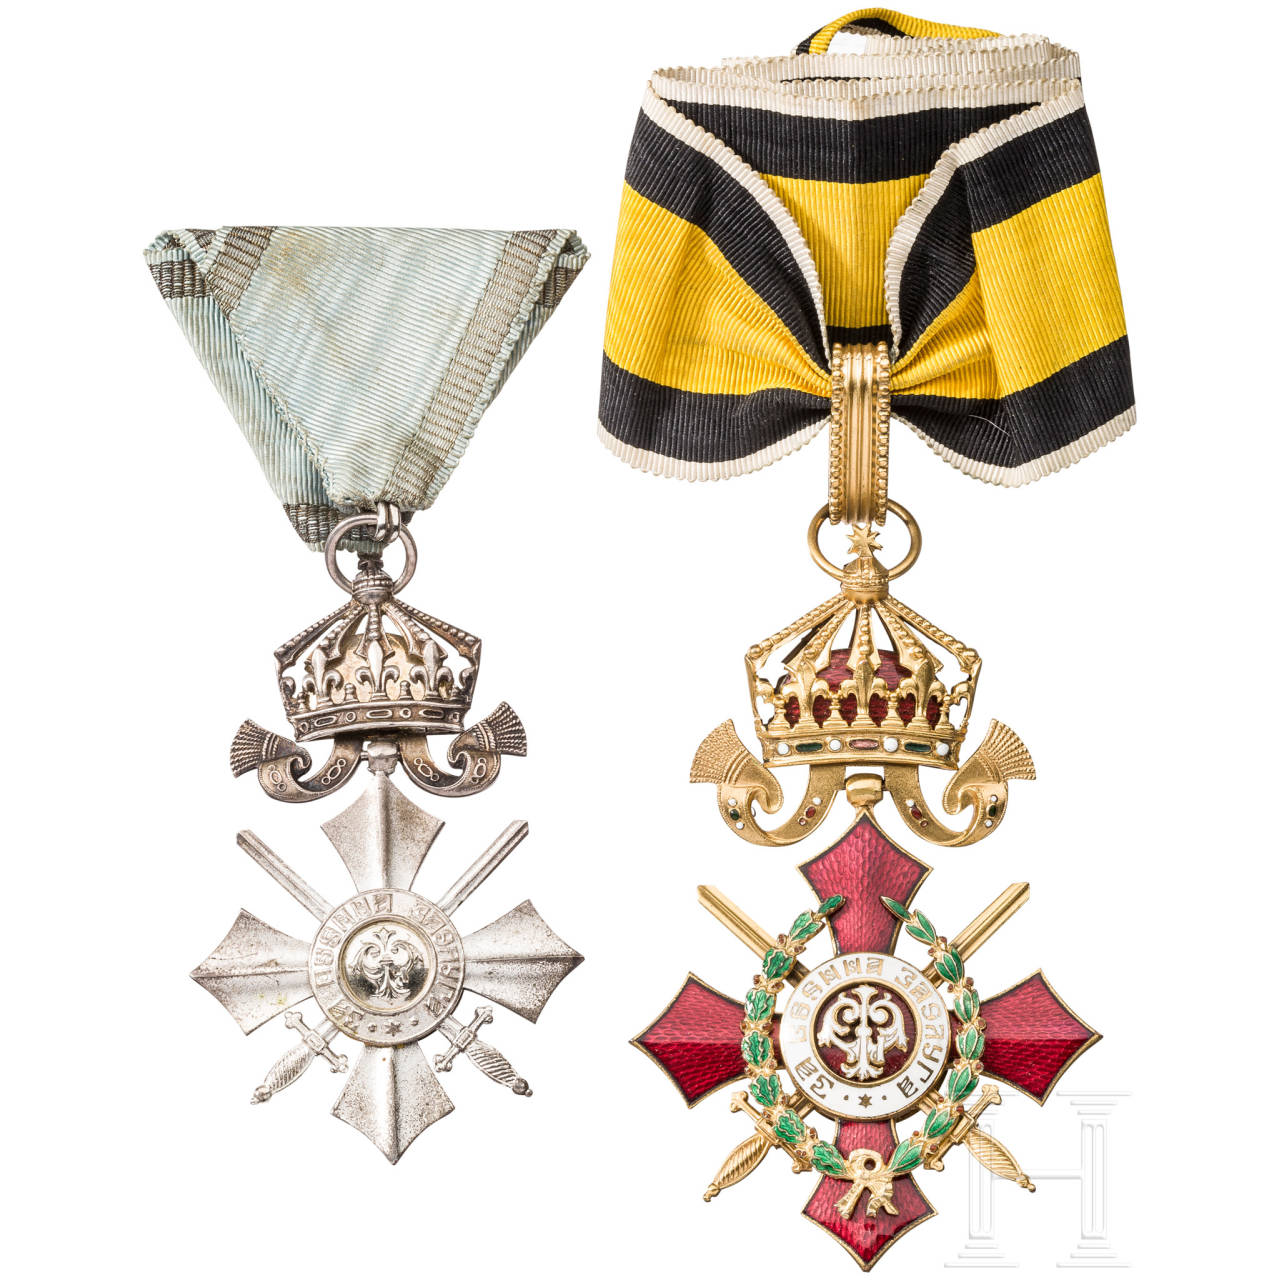 Militärverdienst-Orden 2. Klasse mit Kriegsdekoration, Bulgarien